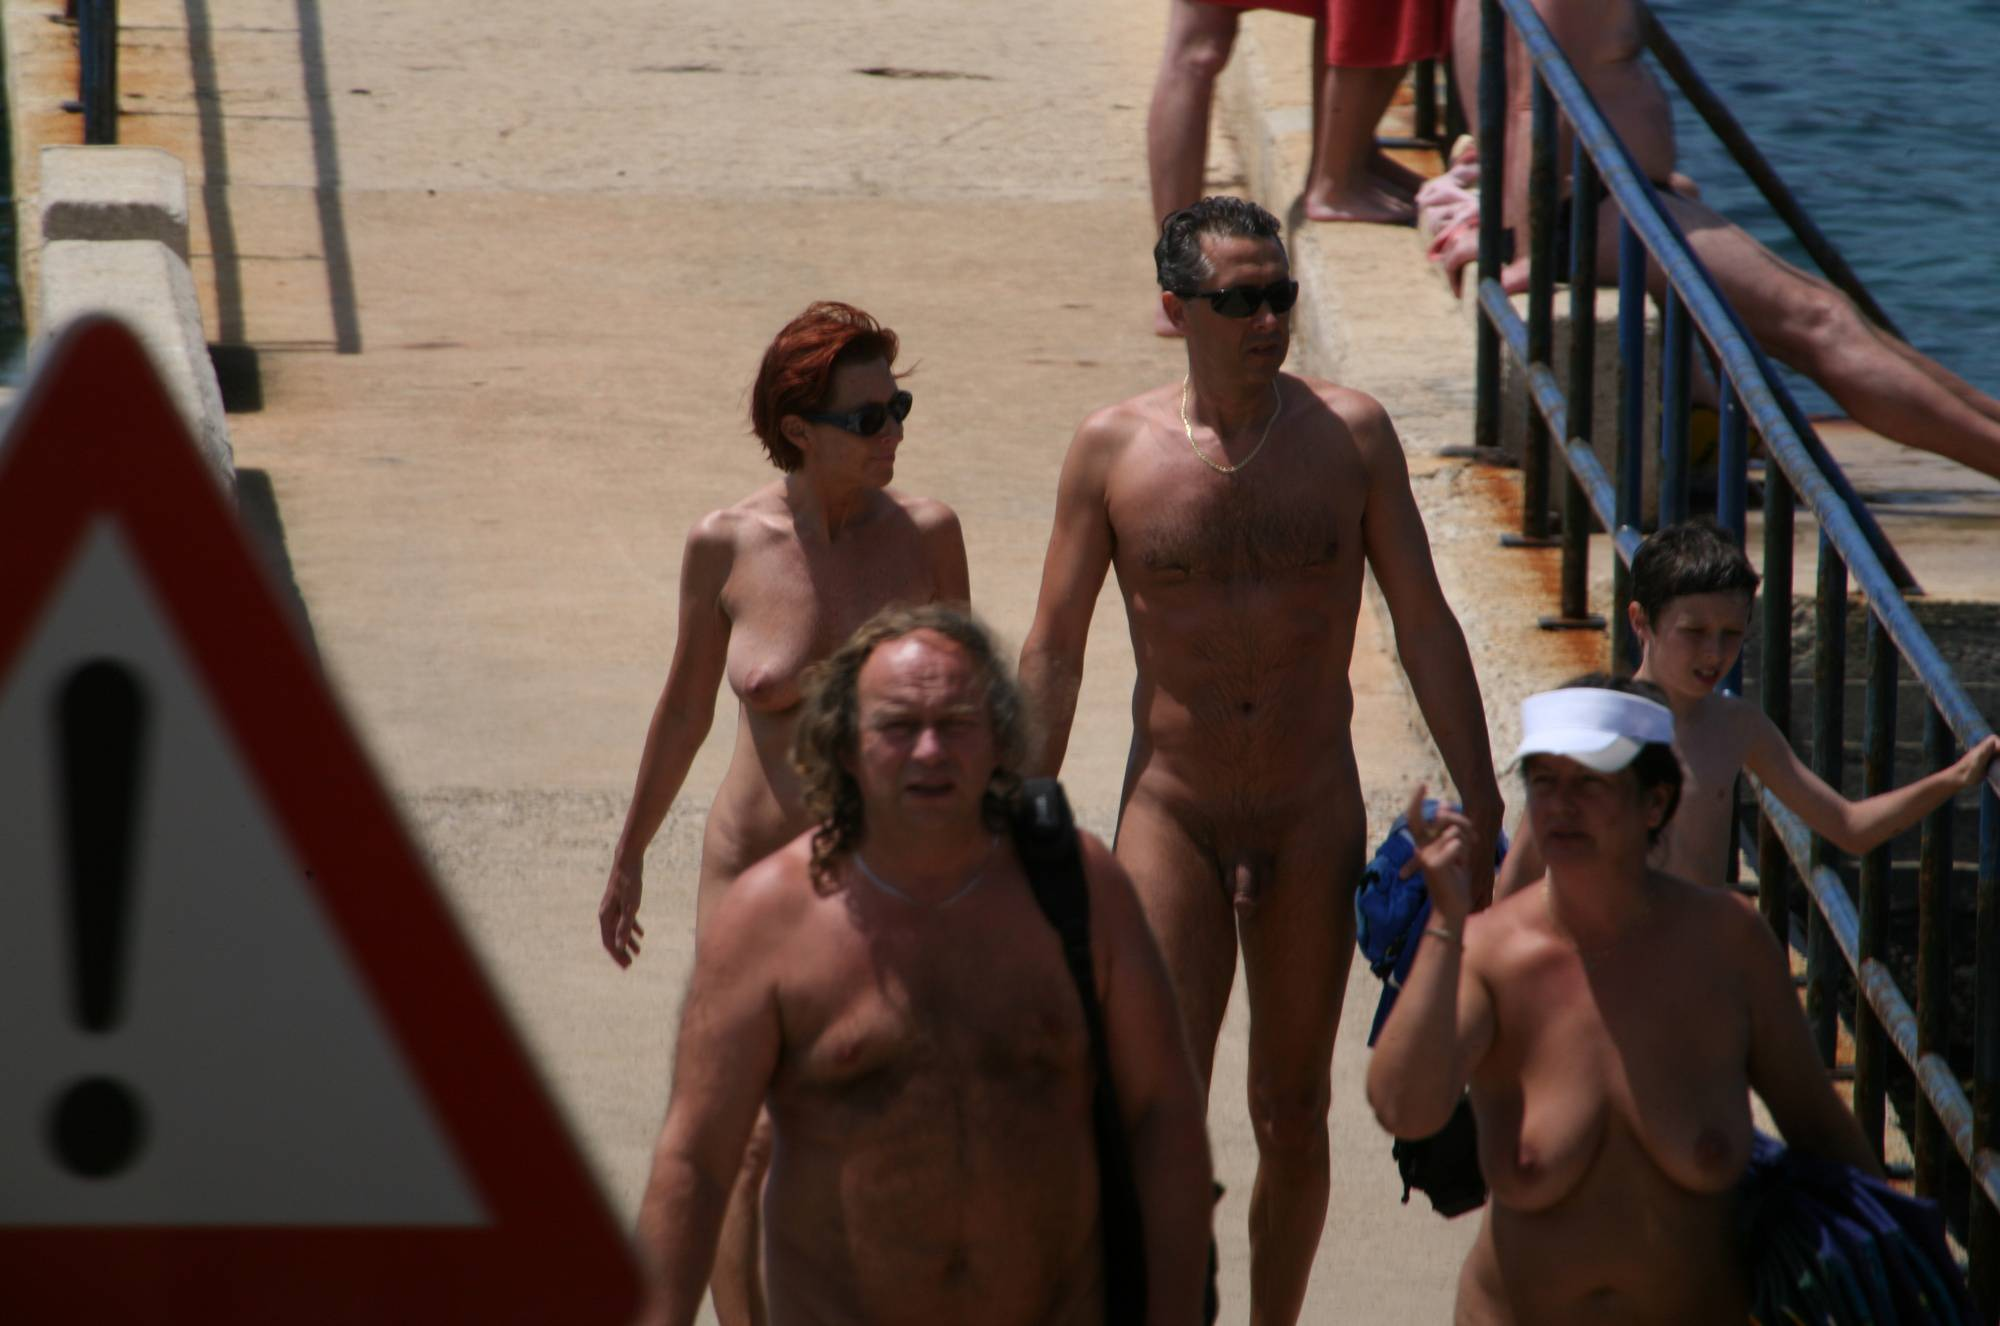 Pure Nudism Images-Coastal Bridge Families - 2